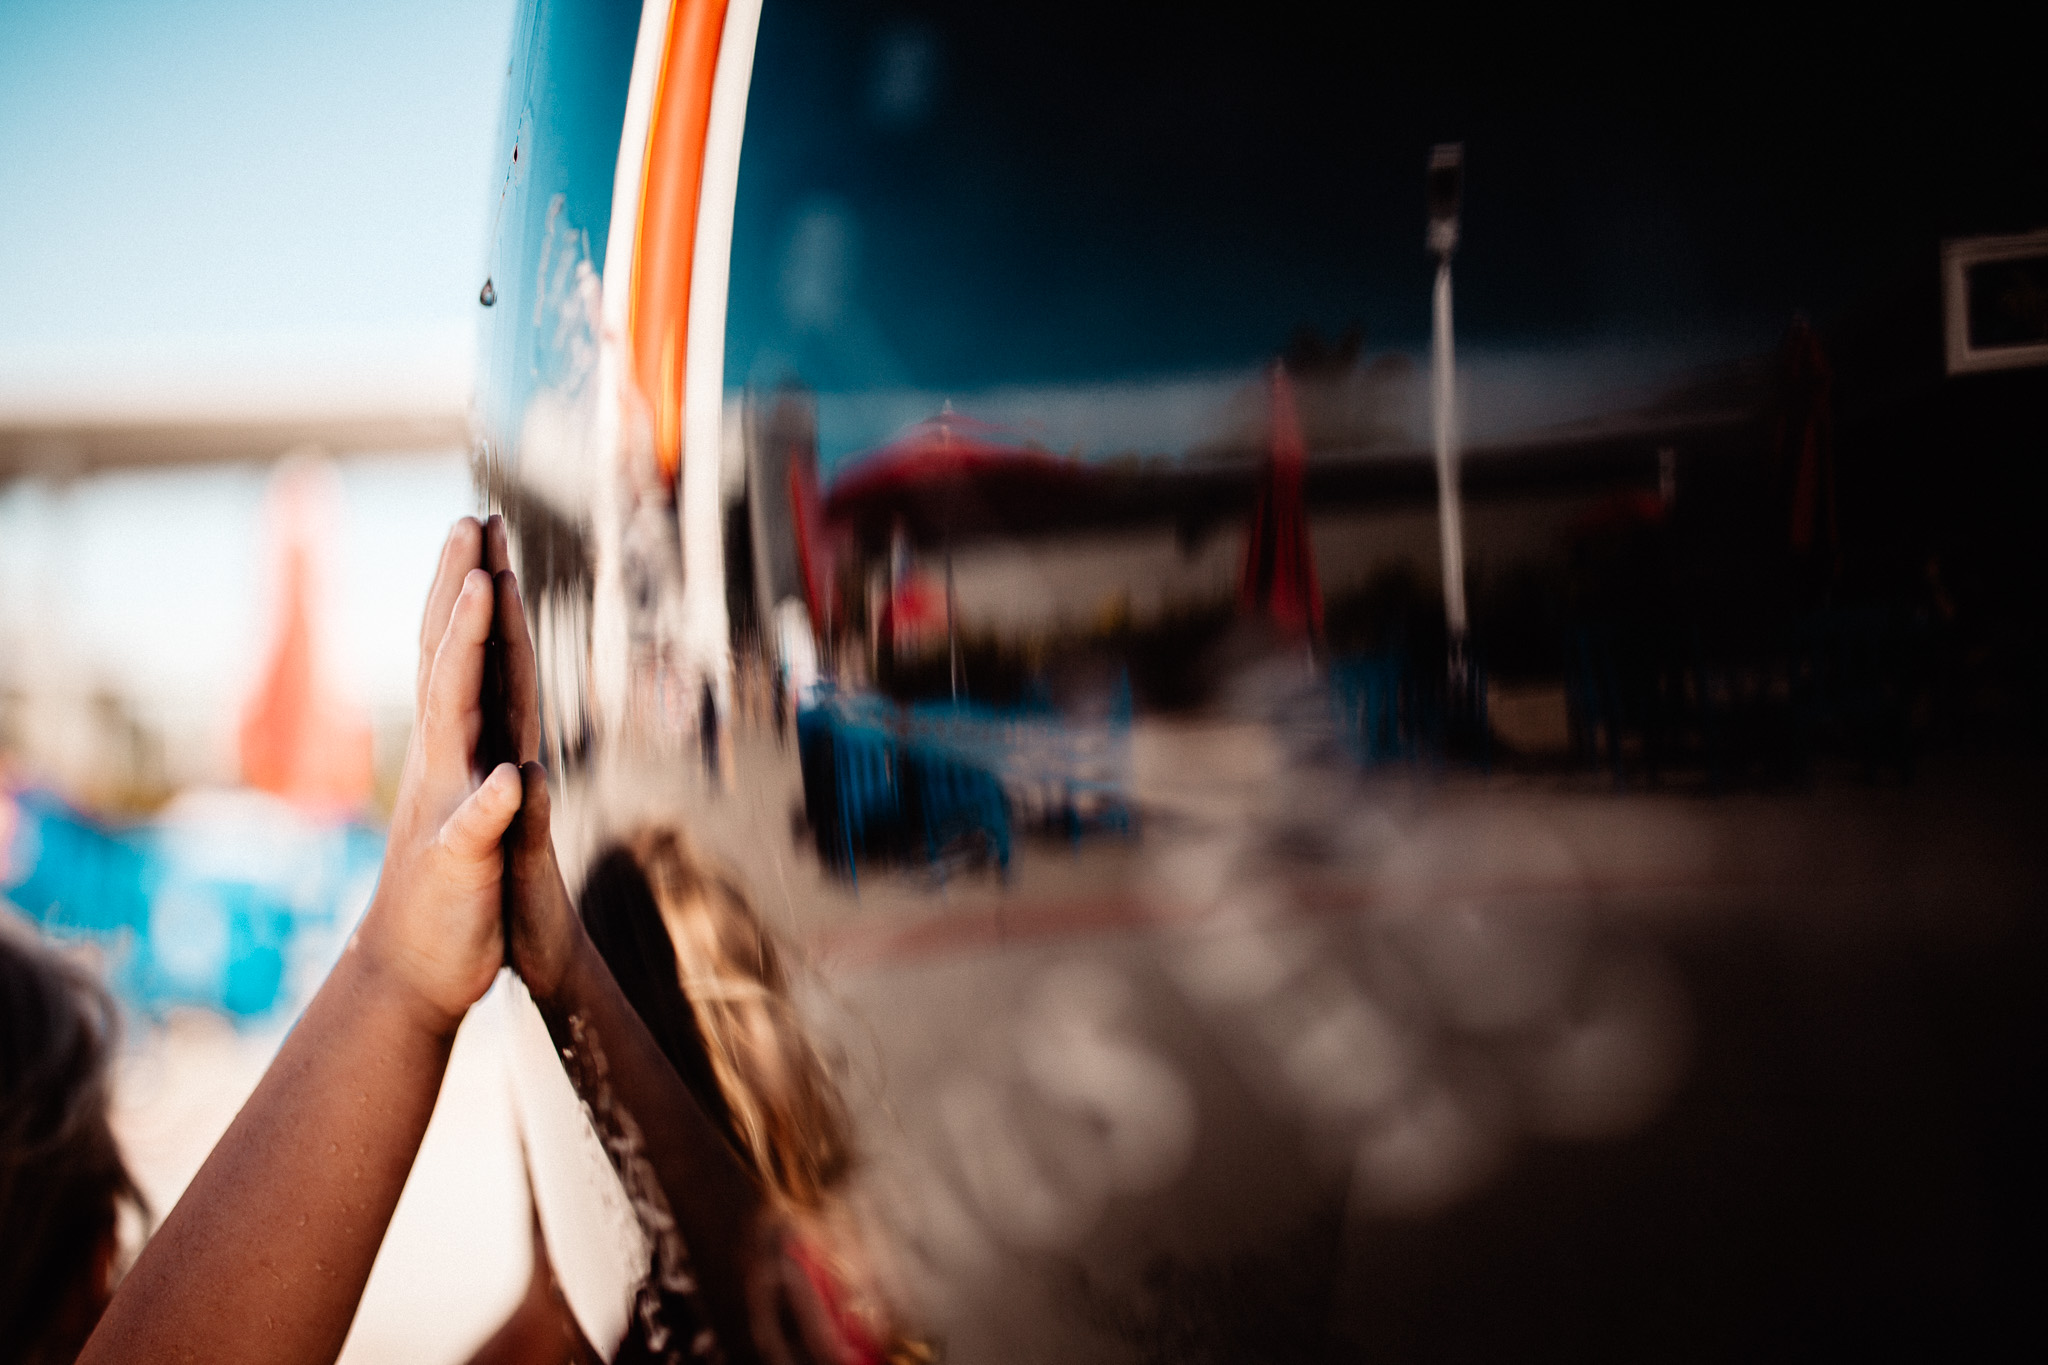 girls hand reflection